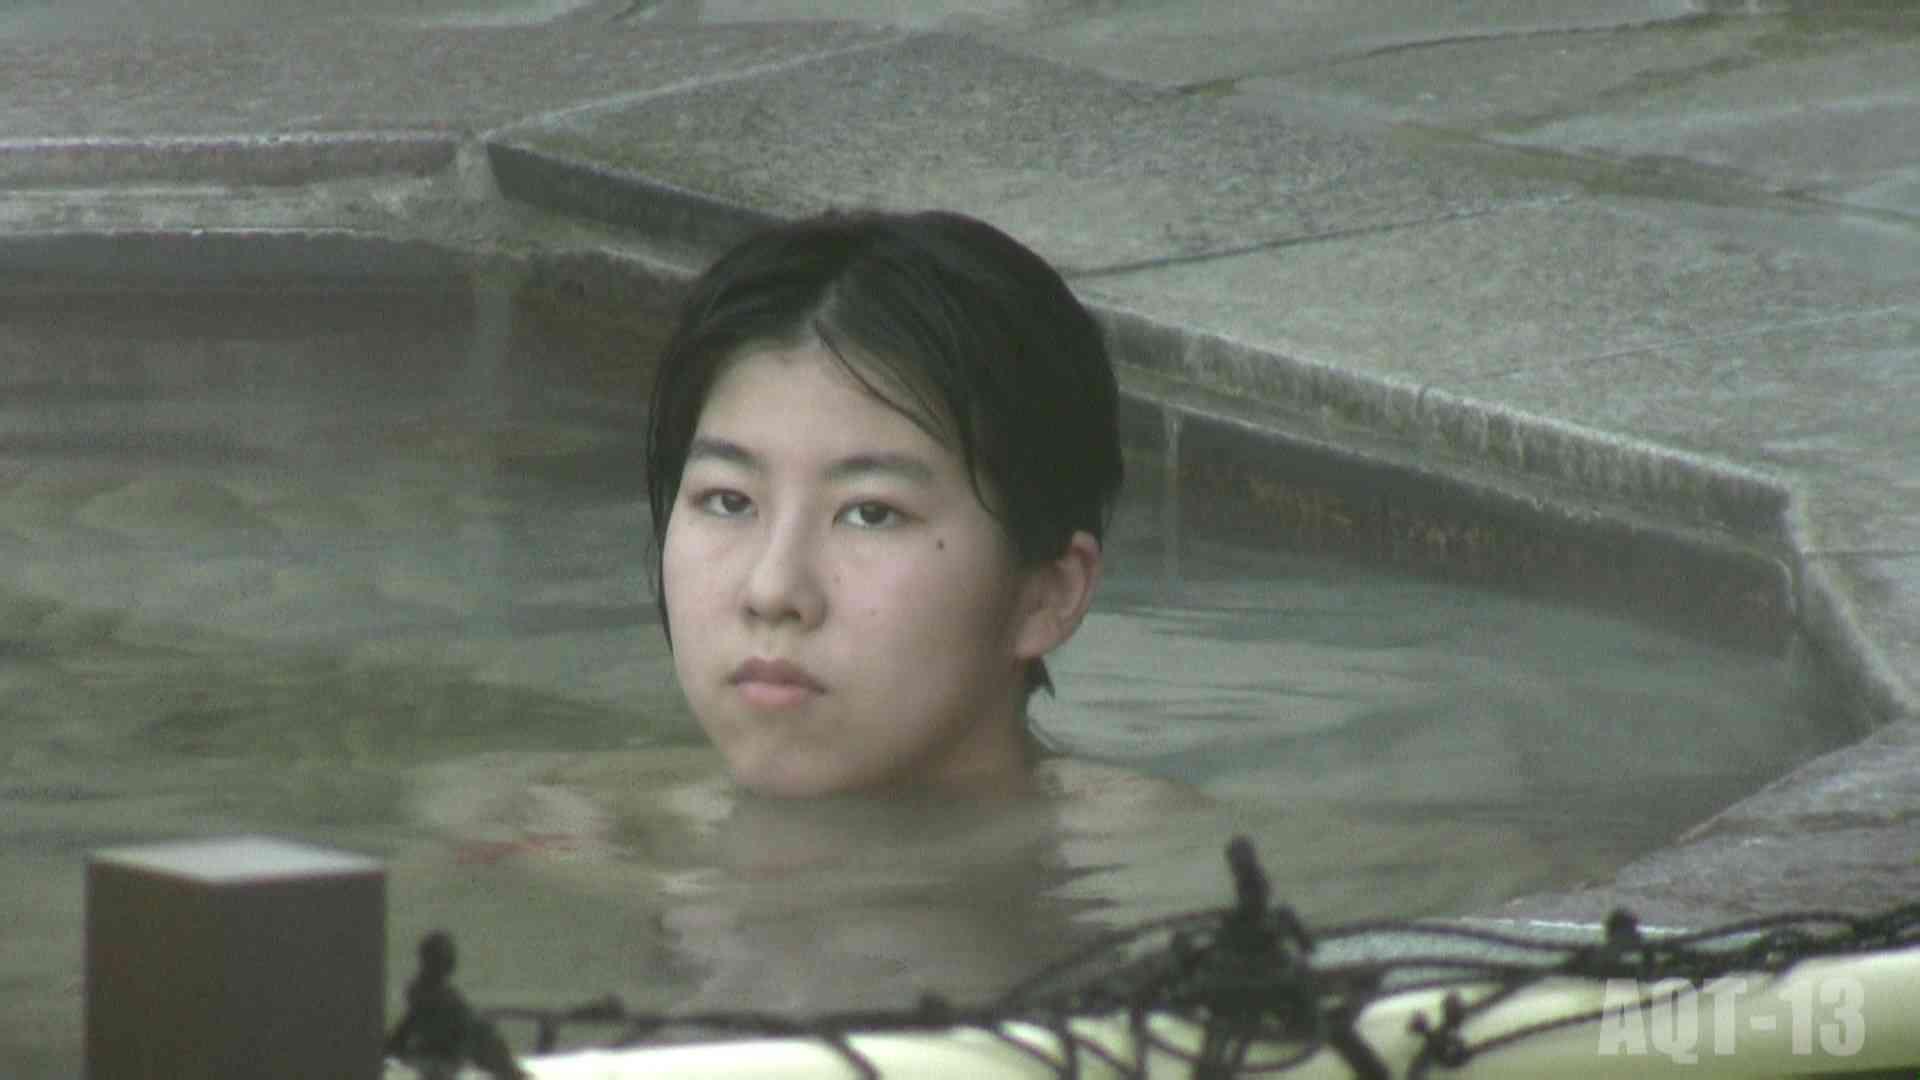 Aquaな露天風呂Vol.816 OLのエロ生活 | 露天風呂  90連発 1